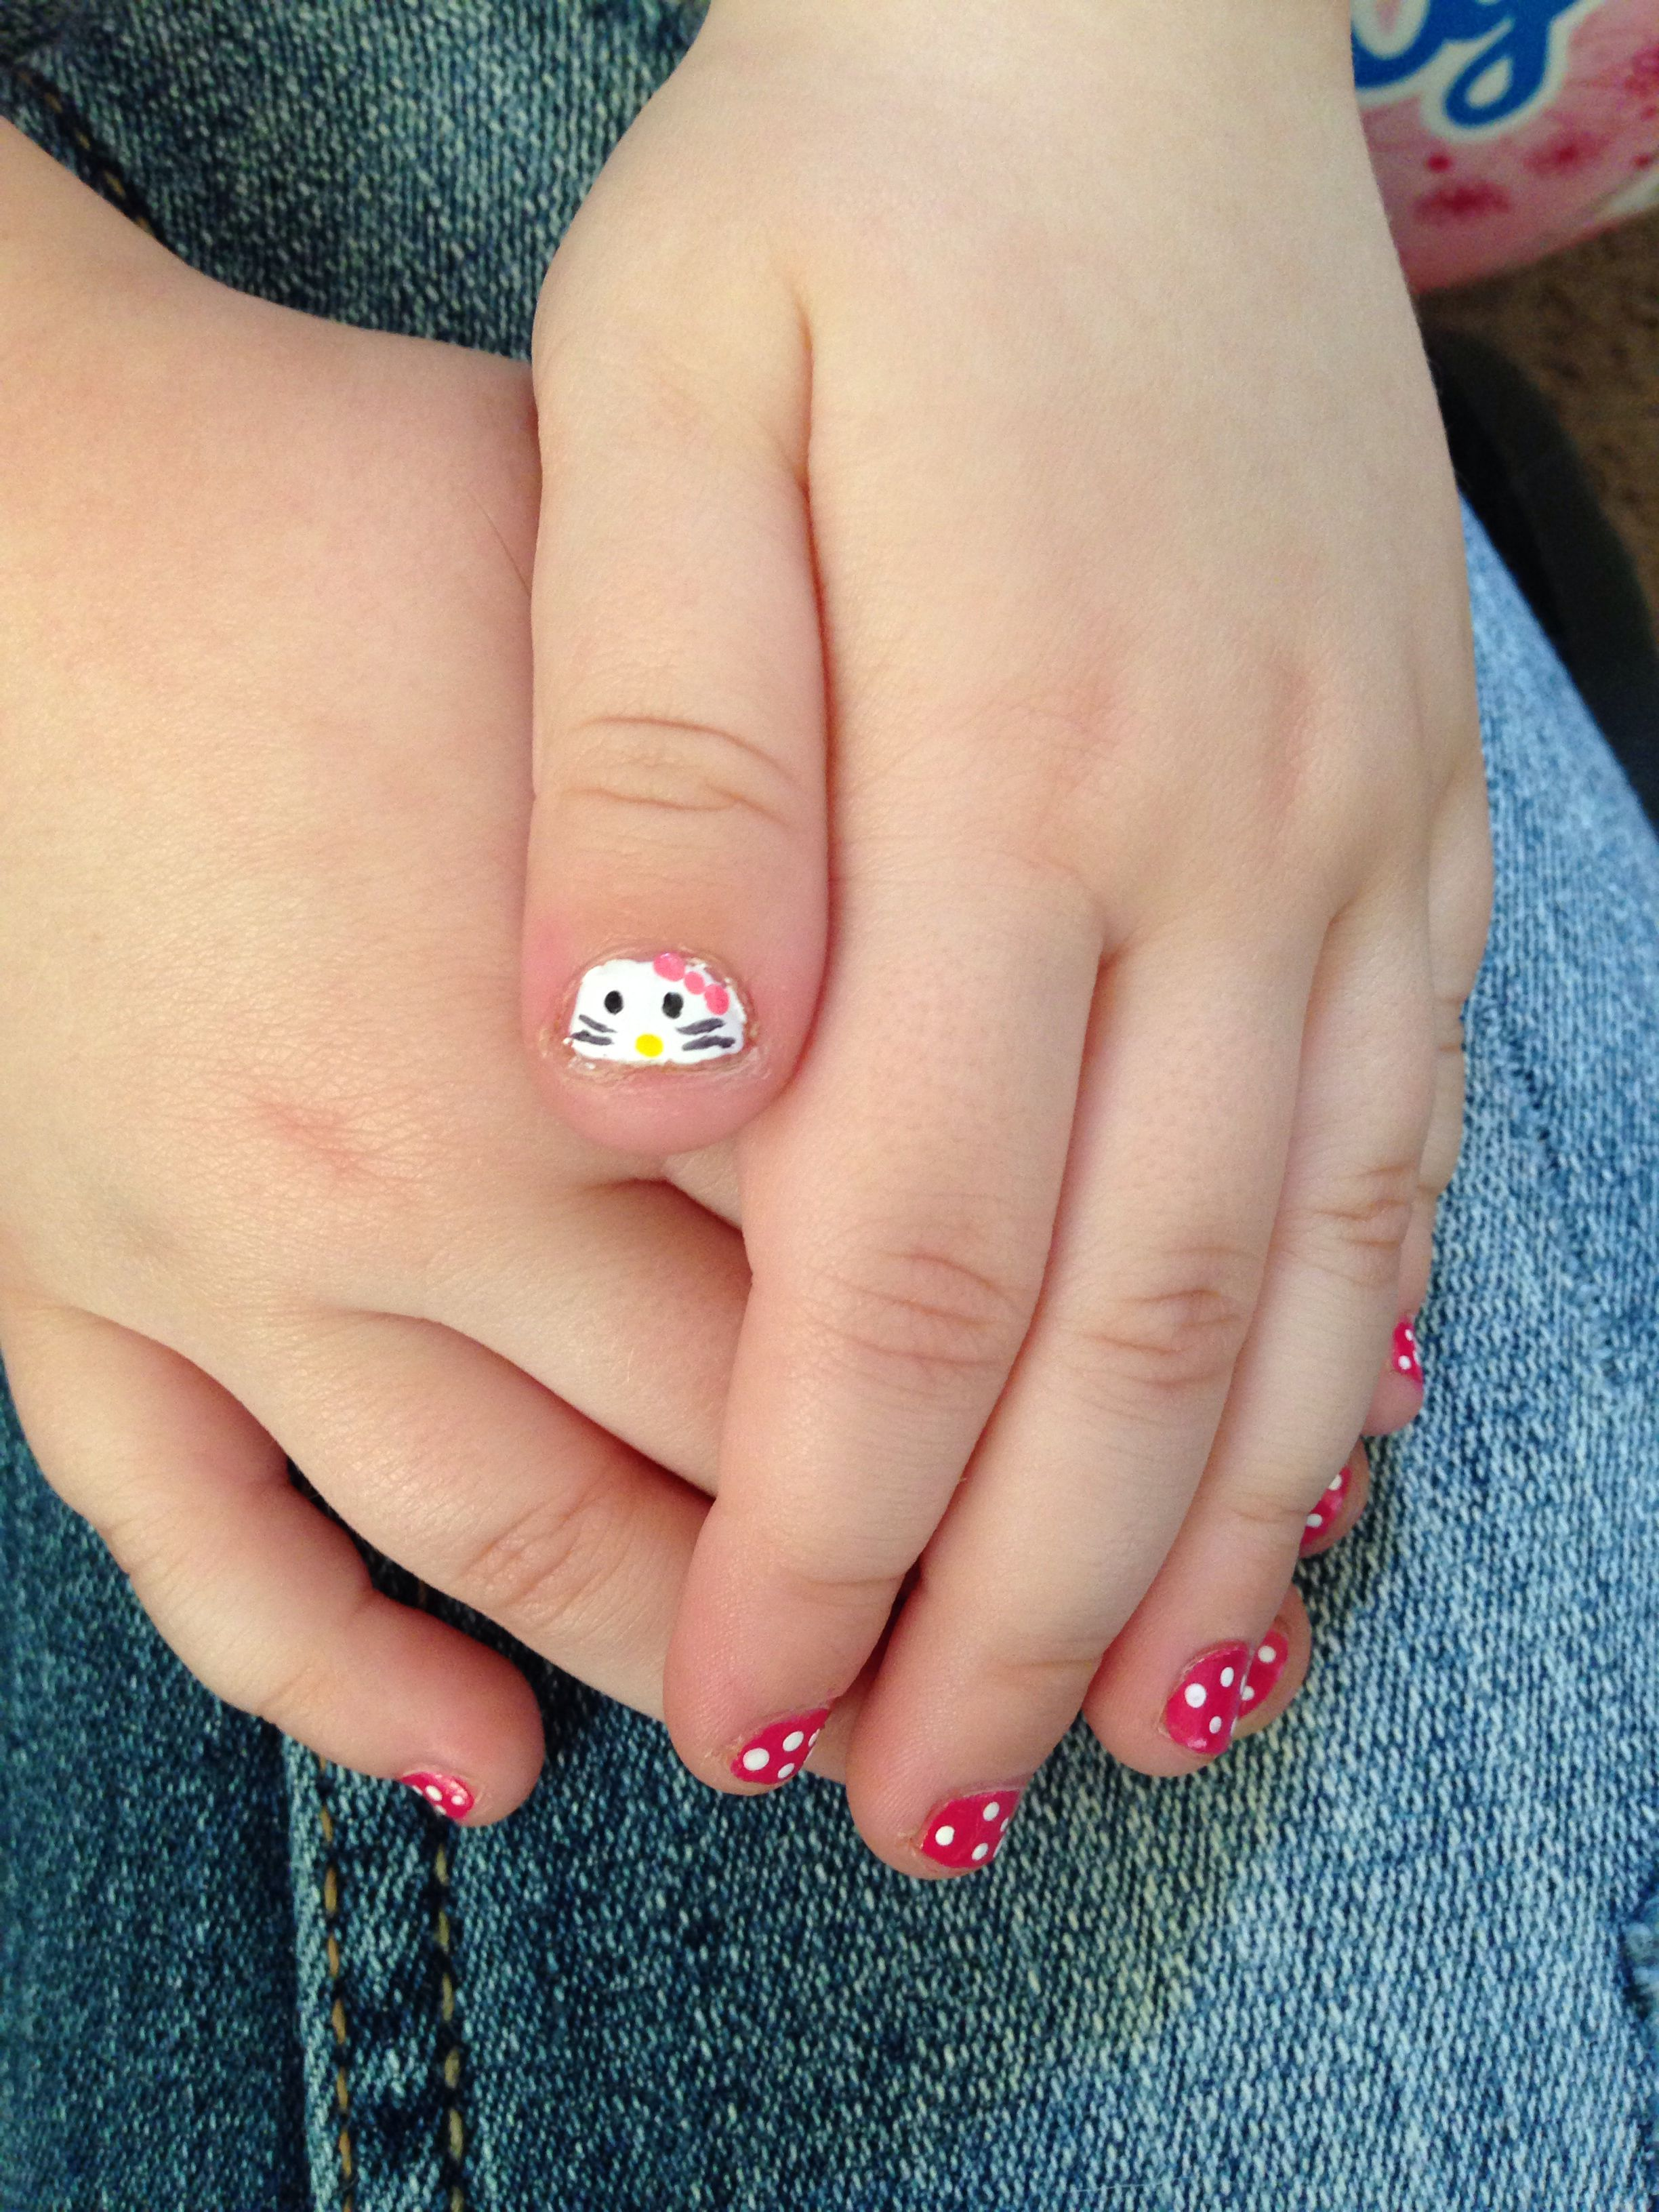 2d59cd2c4 Little girl hello kitty nails | Nails | Nail designs, Girls nail ...